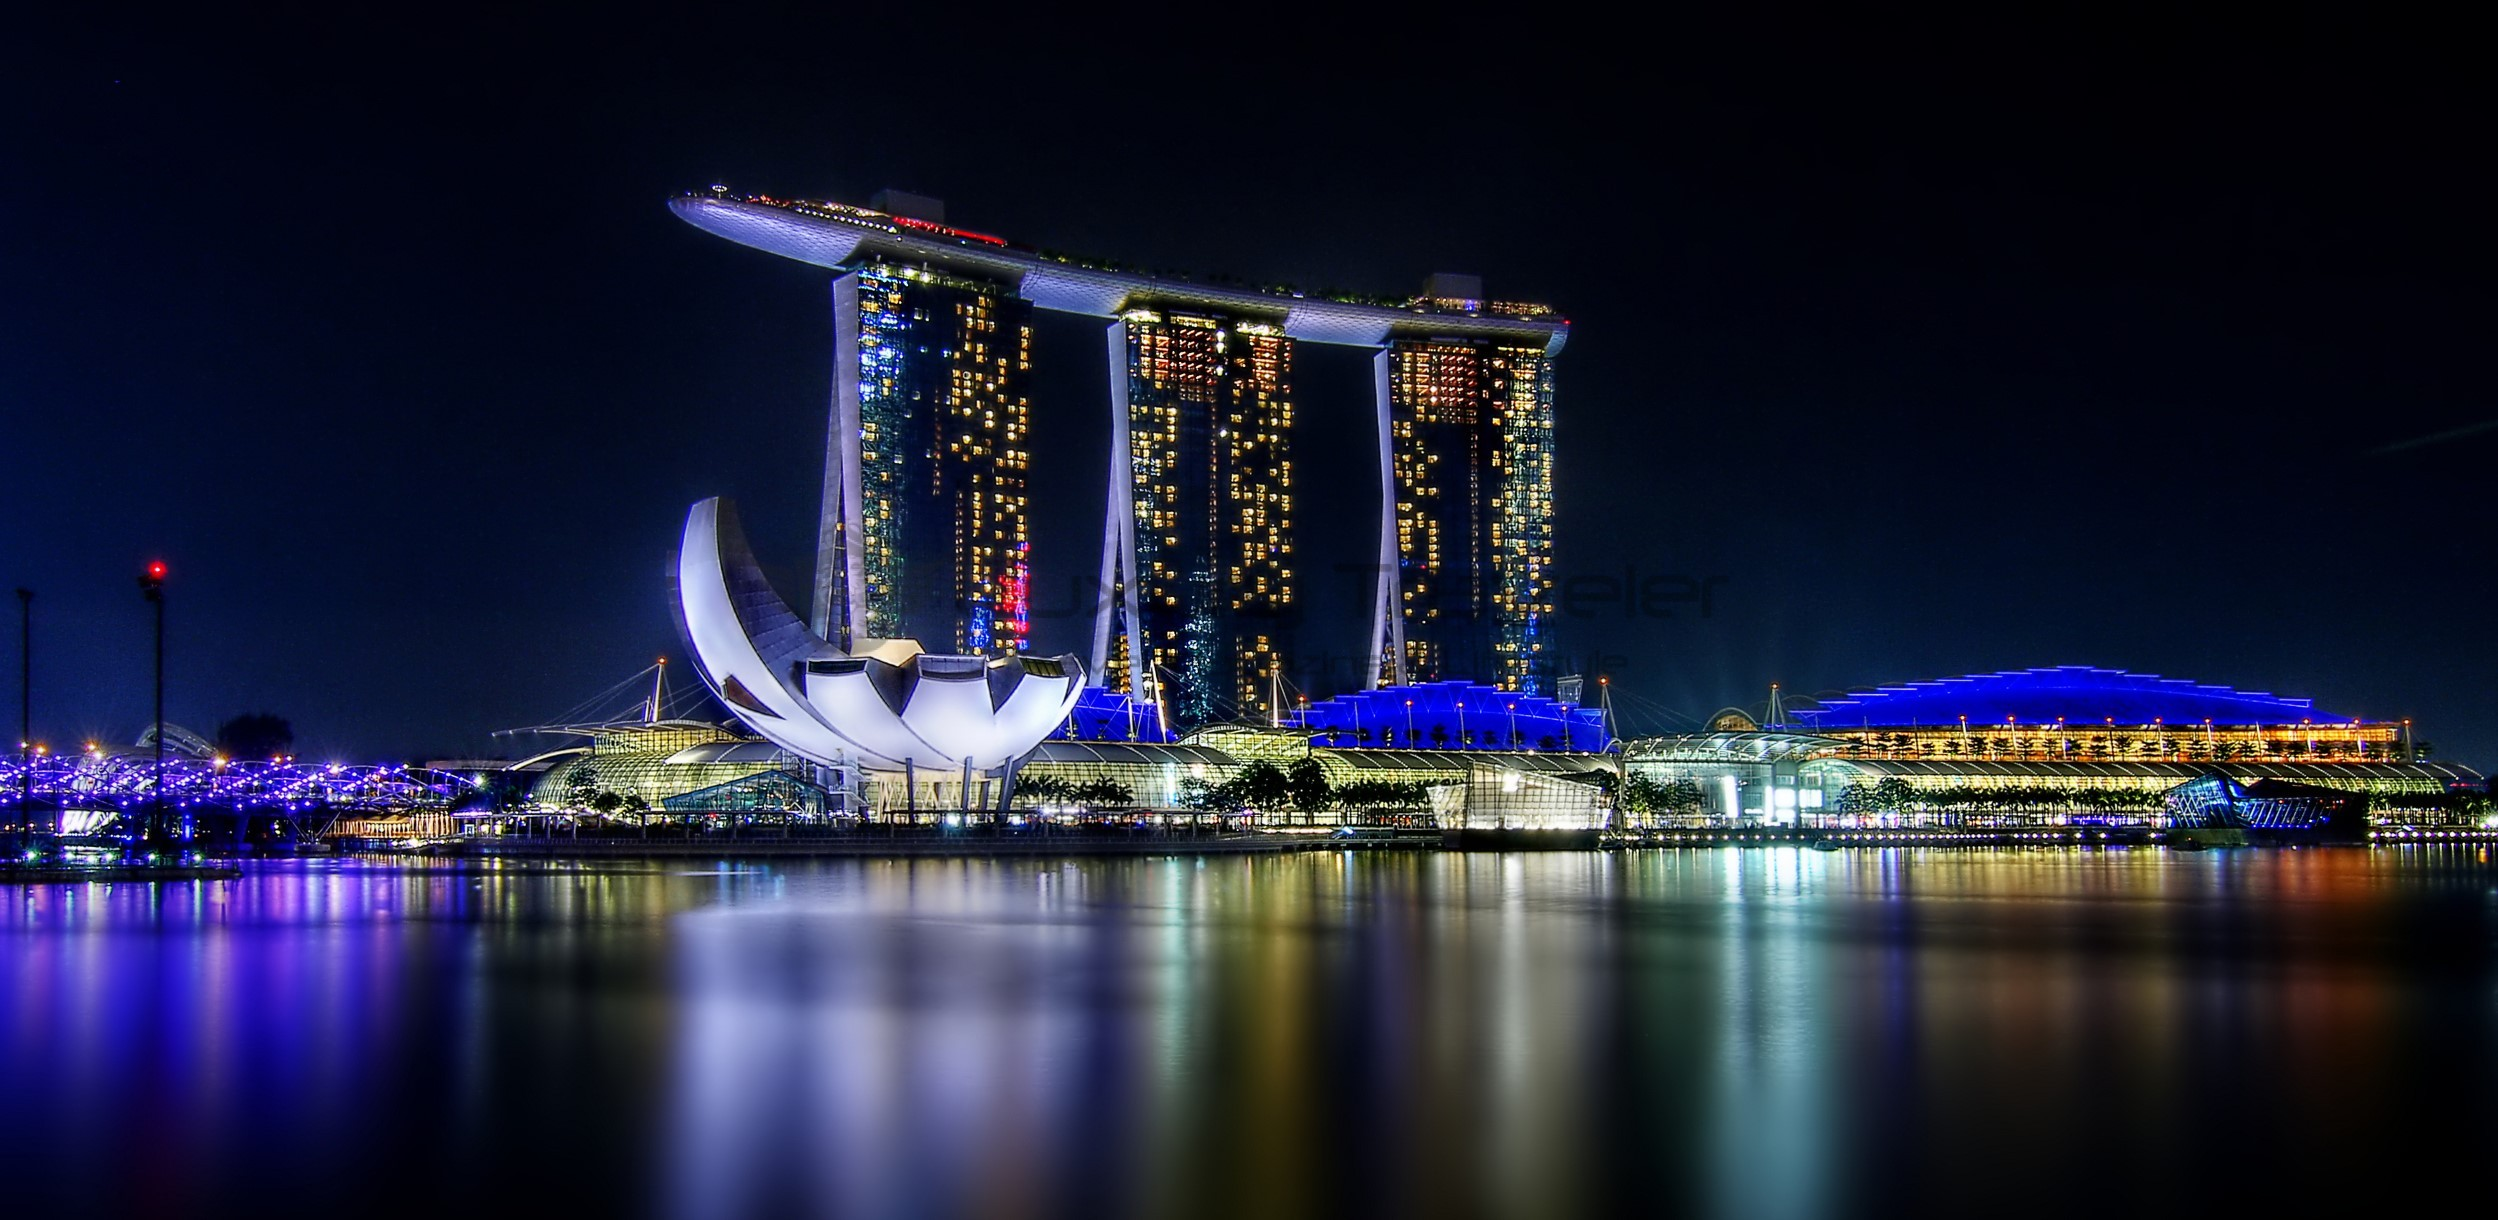 marina-bay-sands-singapore-overlooking